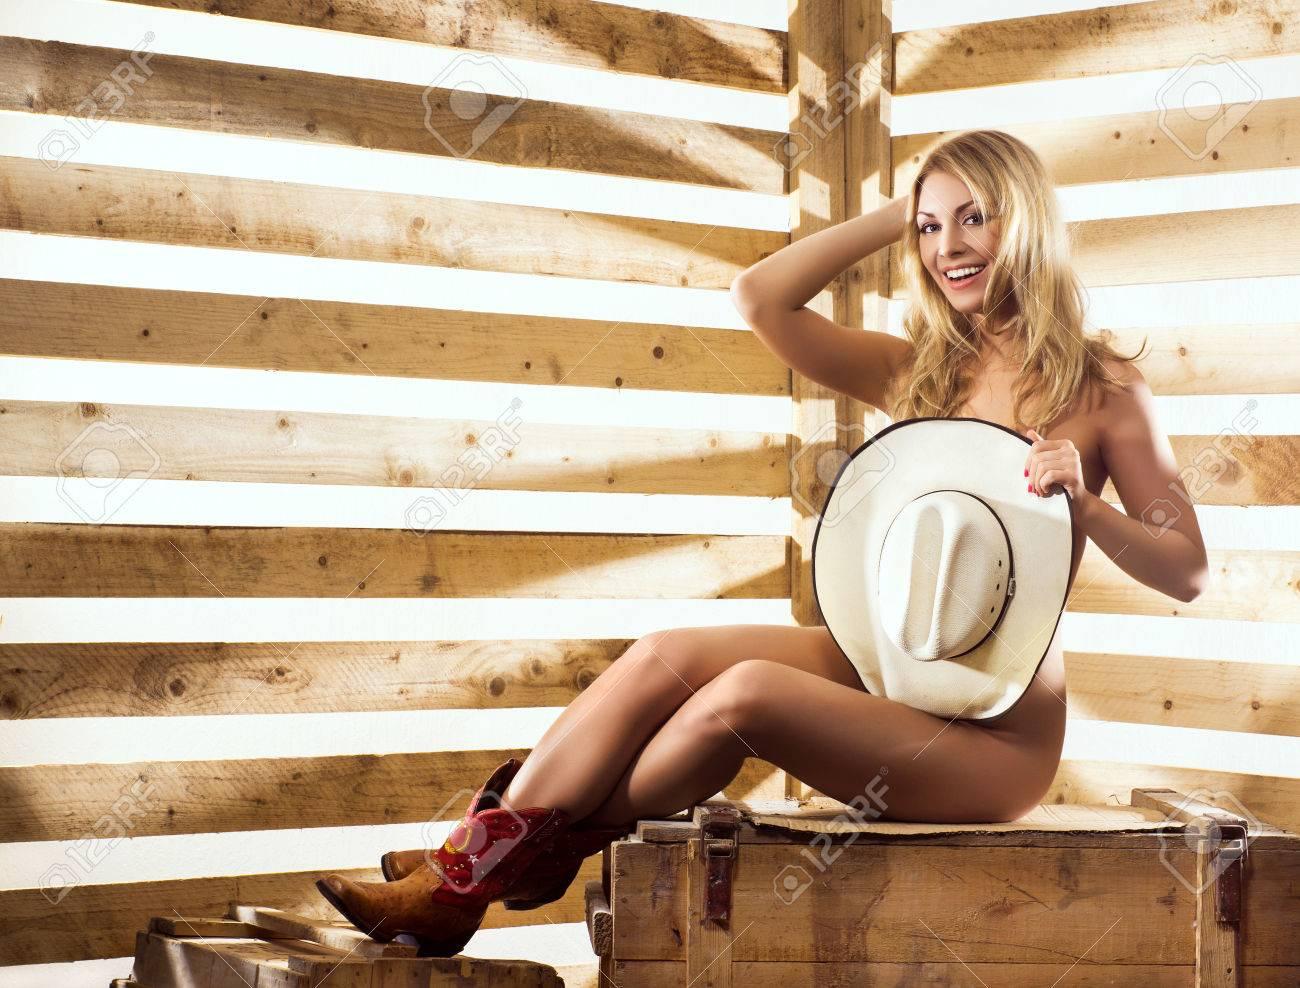 naken cowgirl pics